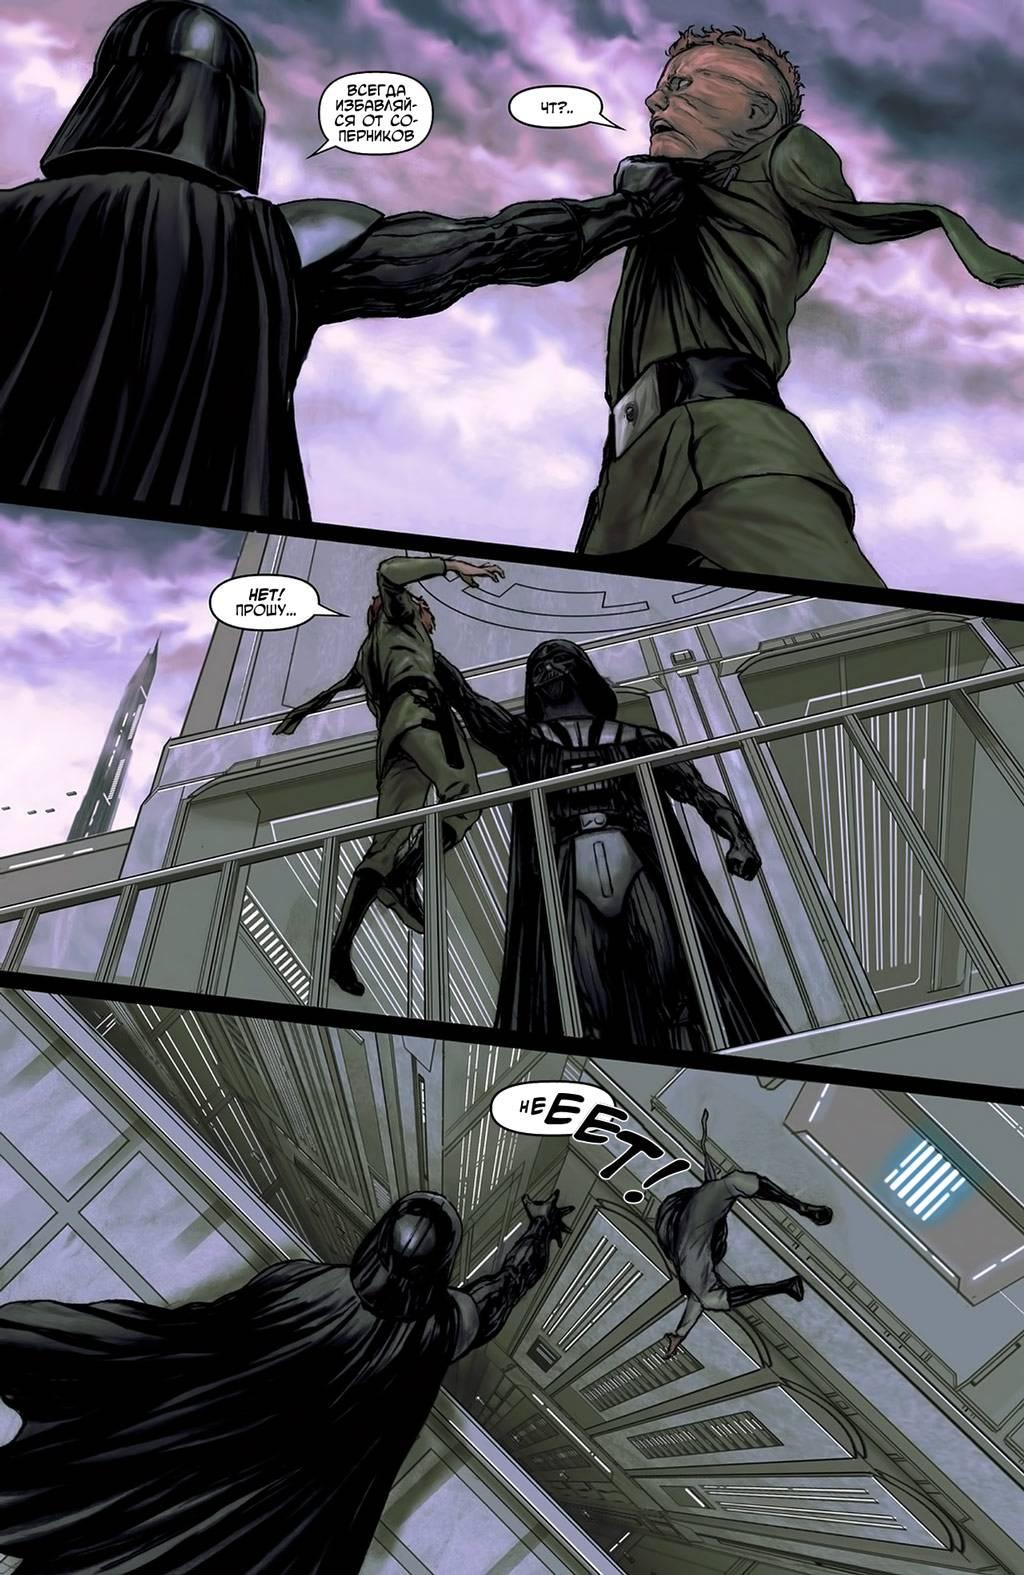 http://img1.unicomics.com/comics/star-wars-darth-vader-and-the-ghost-prison/star-wars-darth-vader-and-the-ghost-prison-5/23.jpg